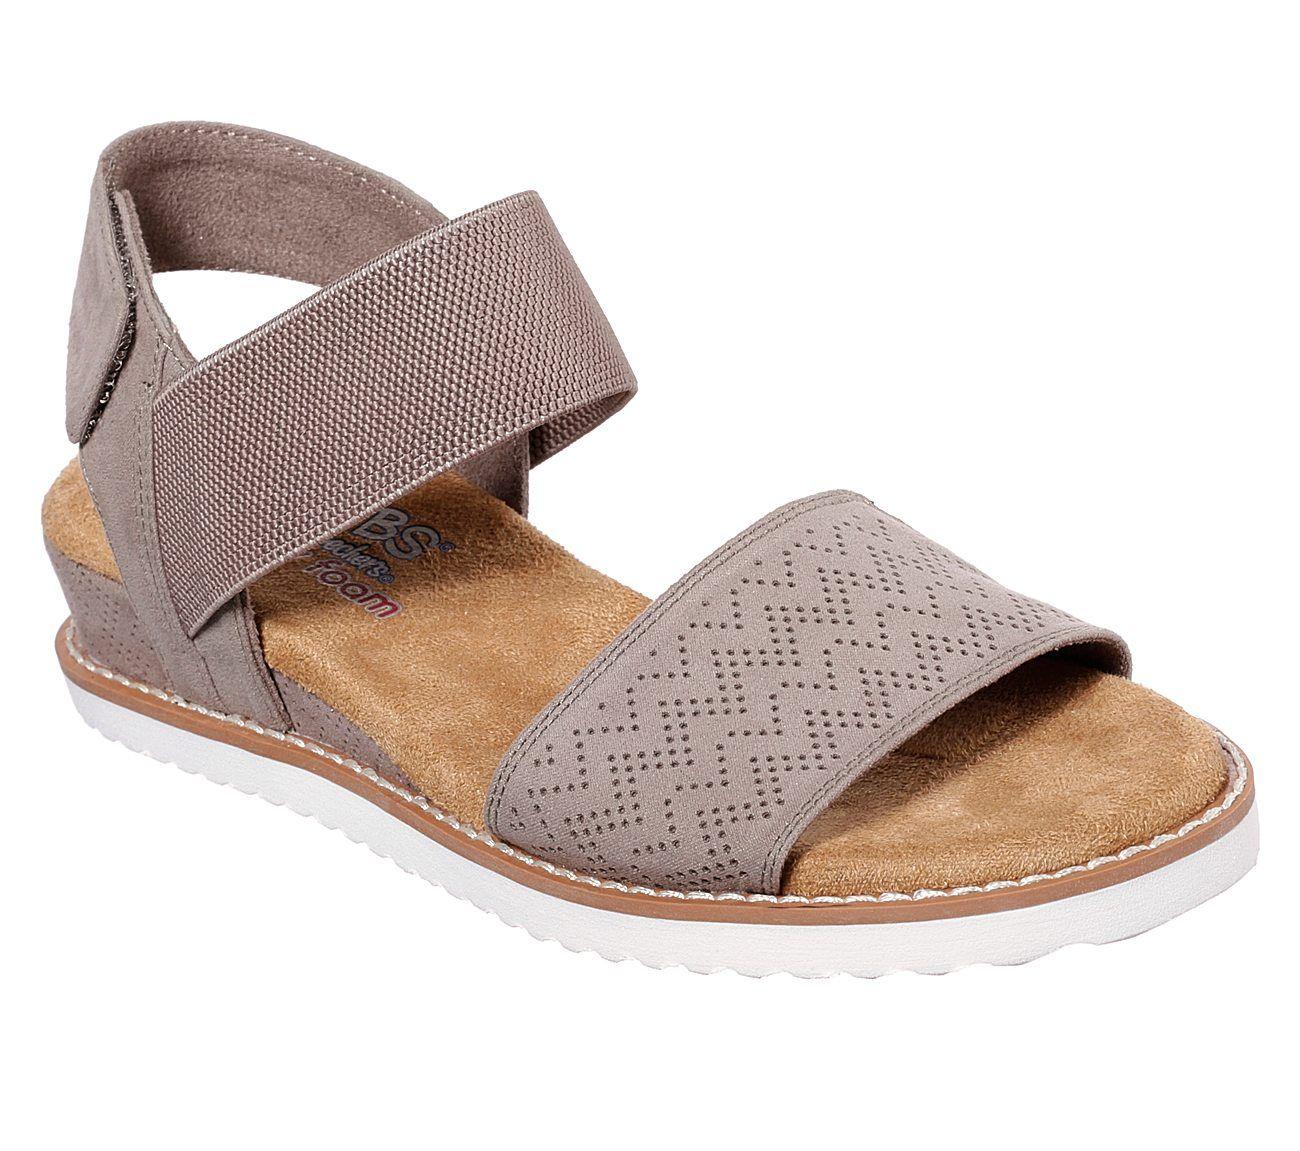 aee6b0589a5 BOBS Desert Kiss | Happy Feet | Bob shoes, Sandals, Comfortable sandals